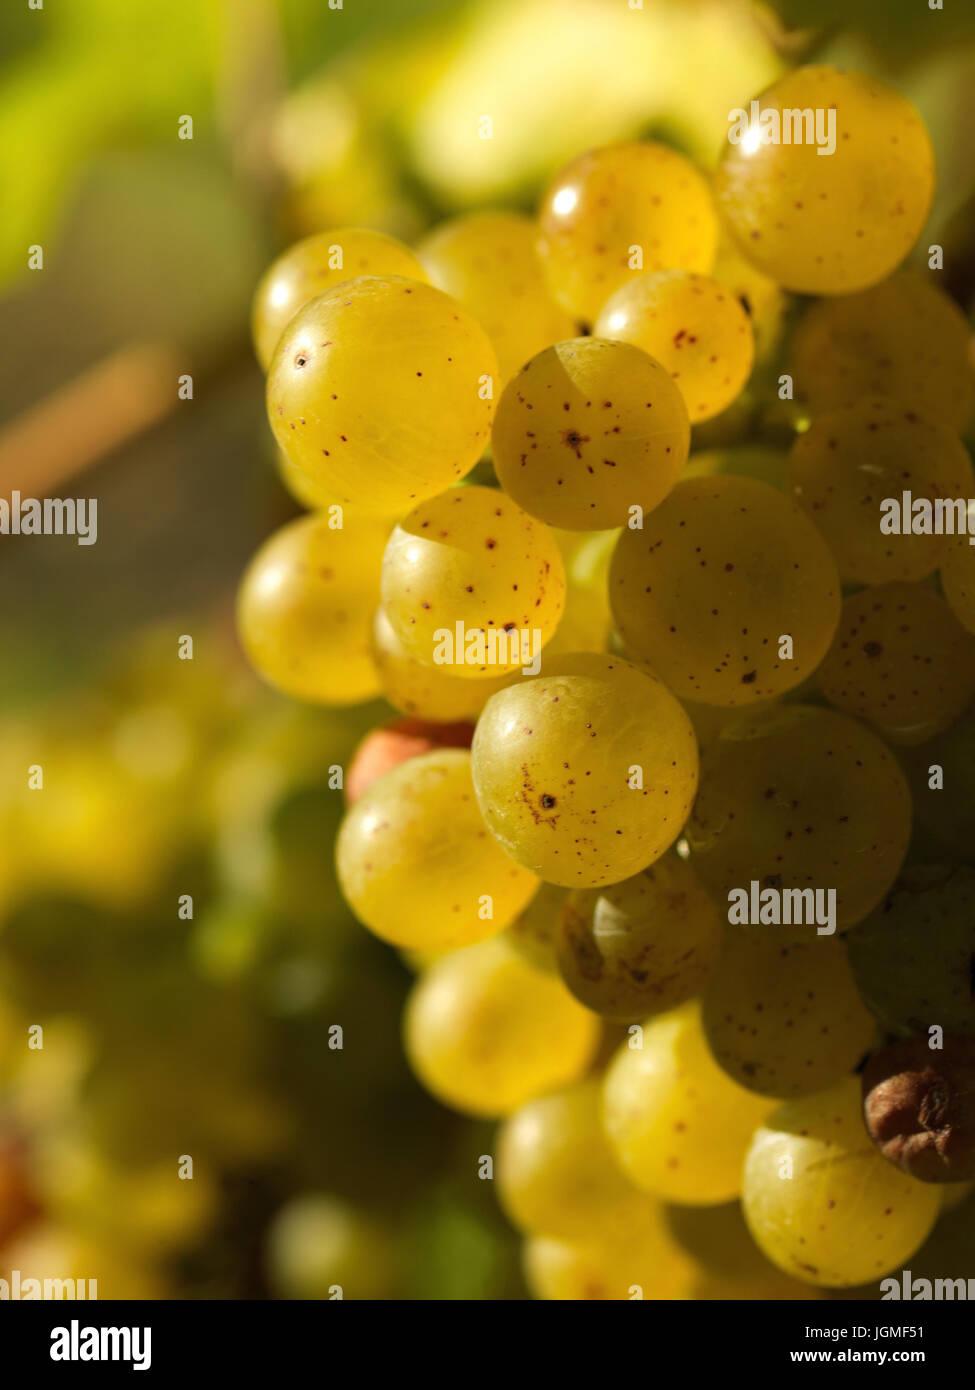 Bunch of grapes - Grape, Weintraube - Grape Stock Photo